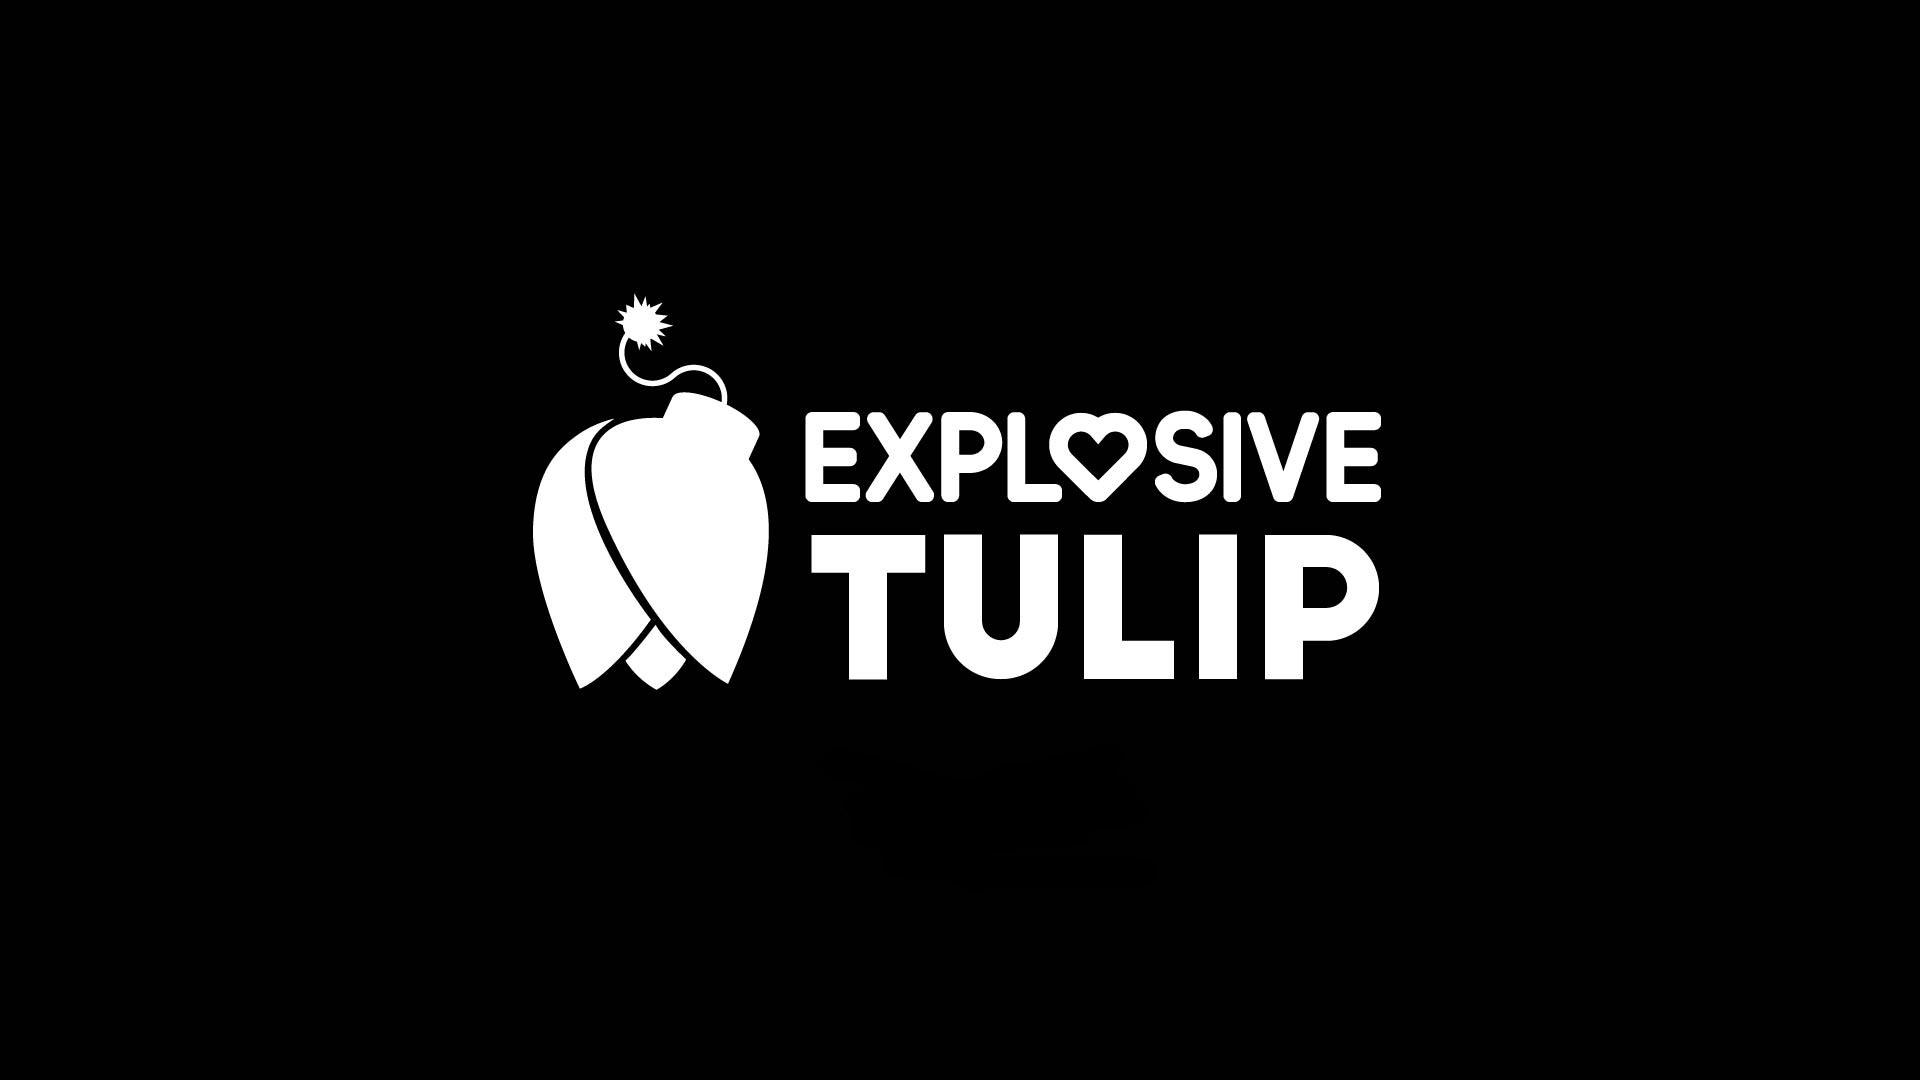 explosivetulip